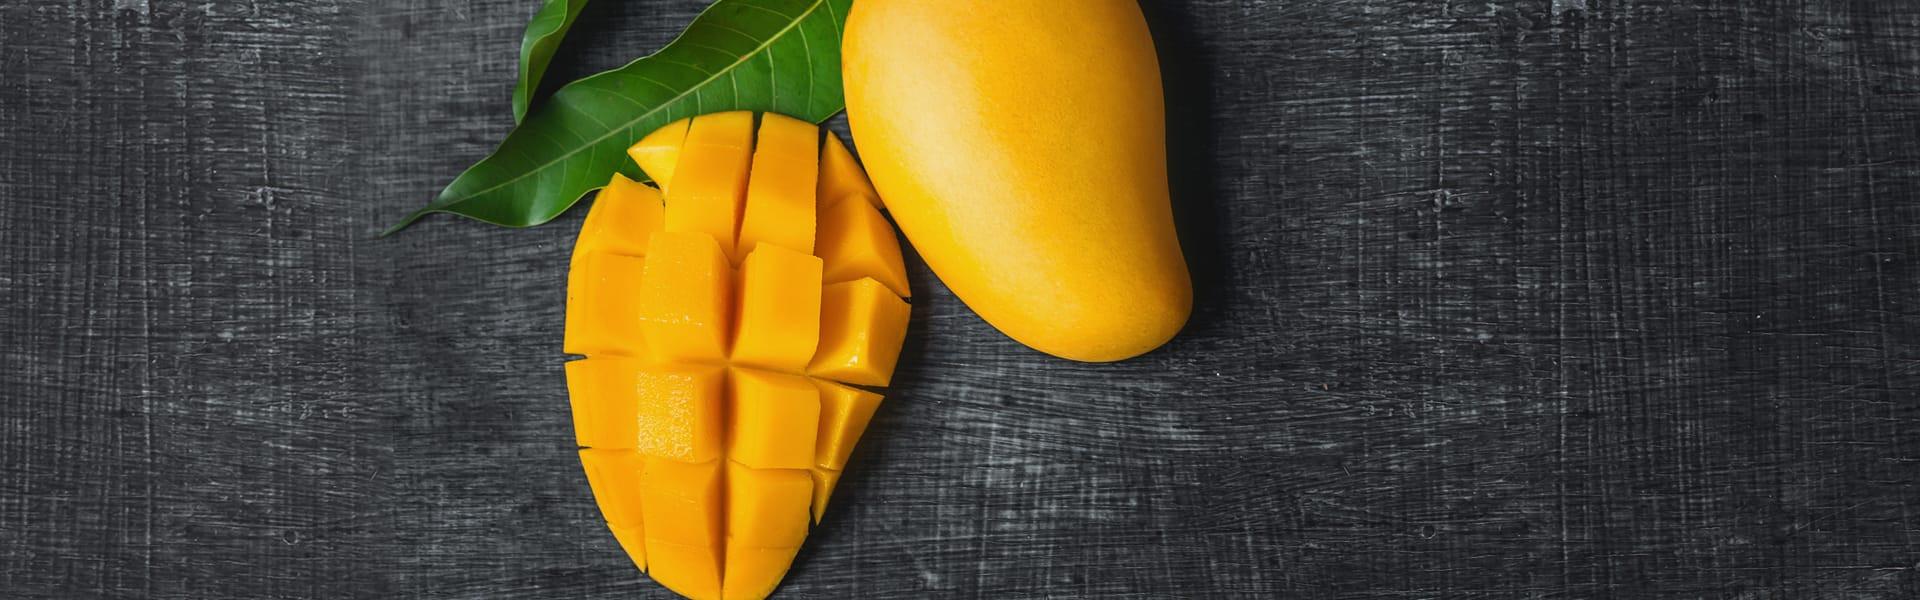 Oui Mango | Alexis Nihon